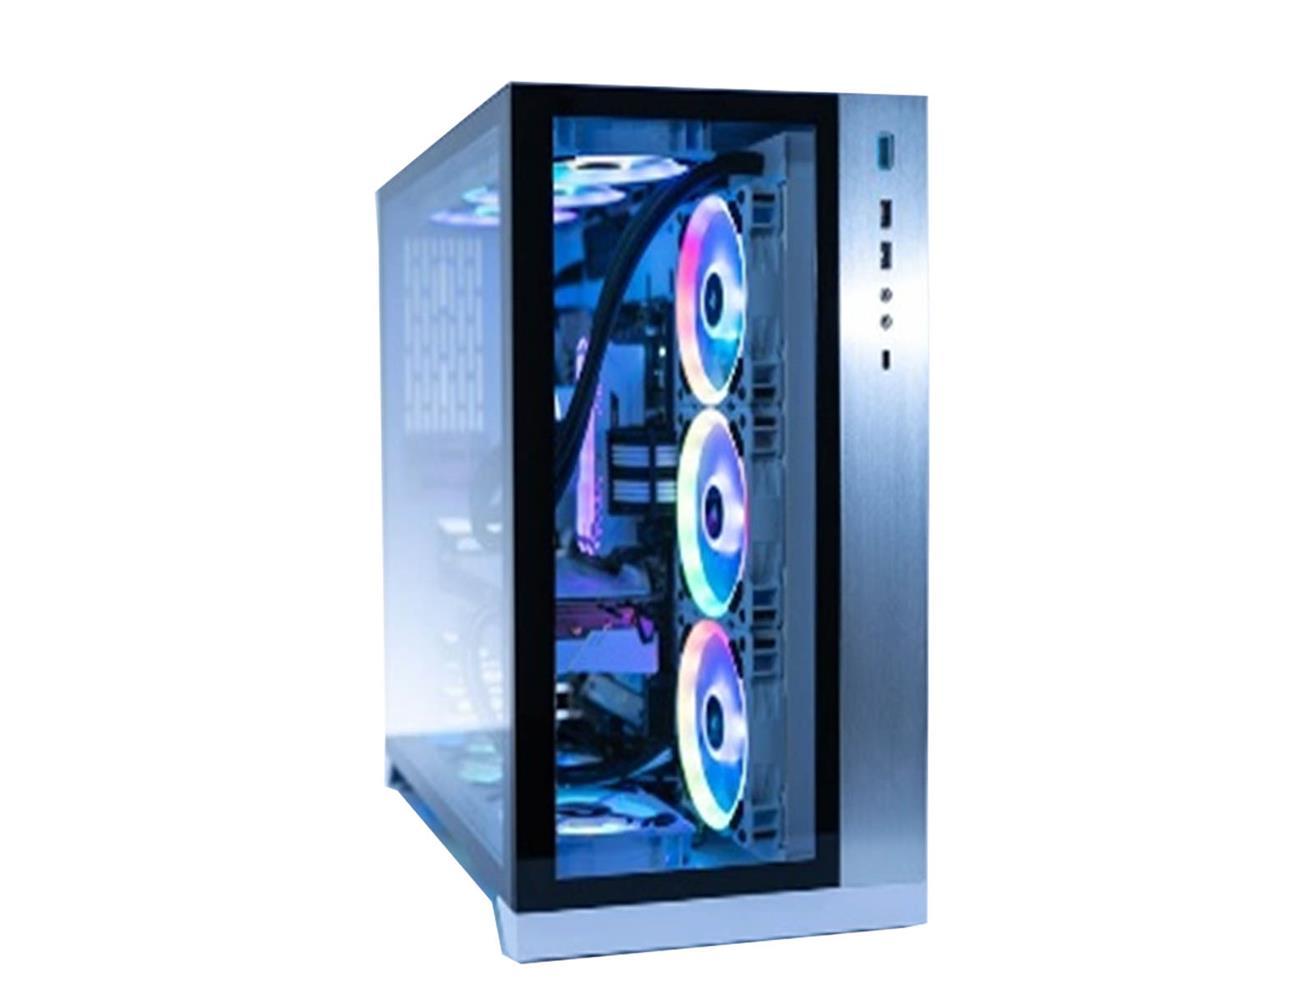 Odrediti Prototip Strogo للبيع كيس كمبيوتر Tedxdharavi Com